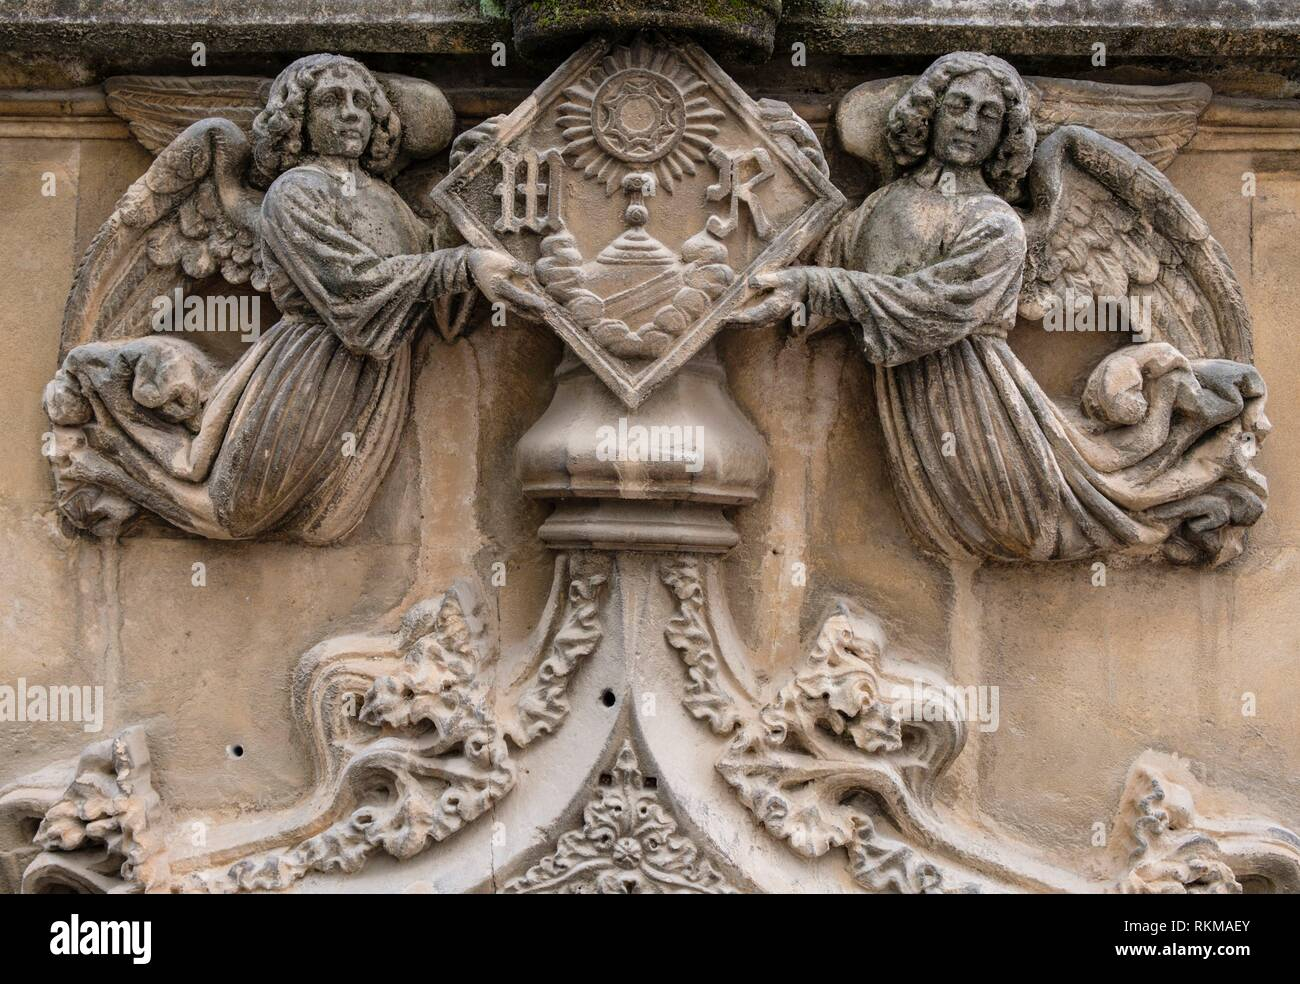 relieves de la Reial academia de belles Arts, Carrer de la Rosa, 3, Palma, Mallorca, balearic islands, Spain. - Stock Image